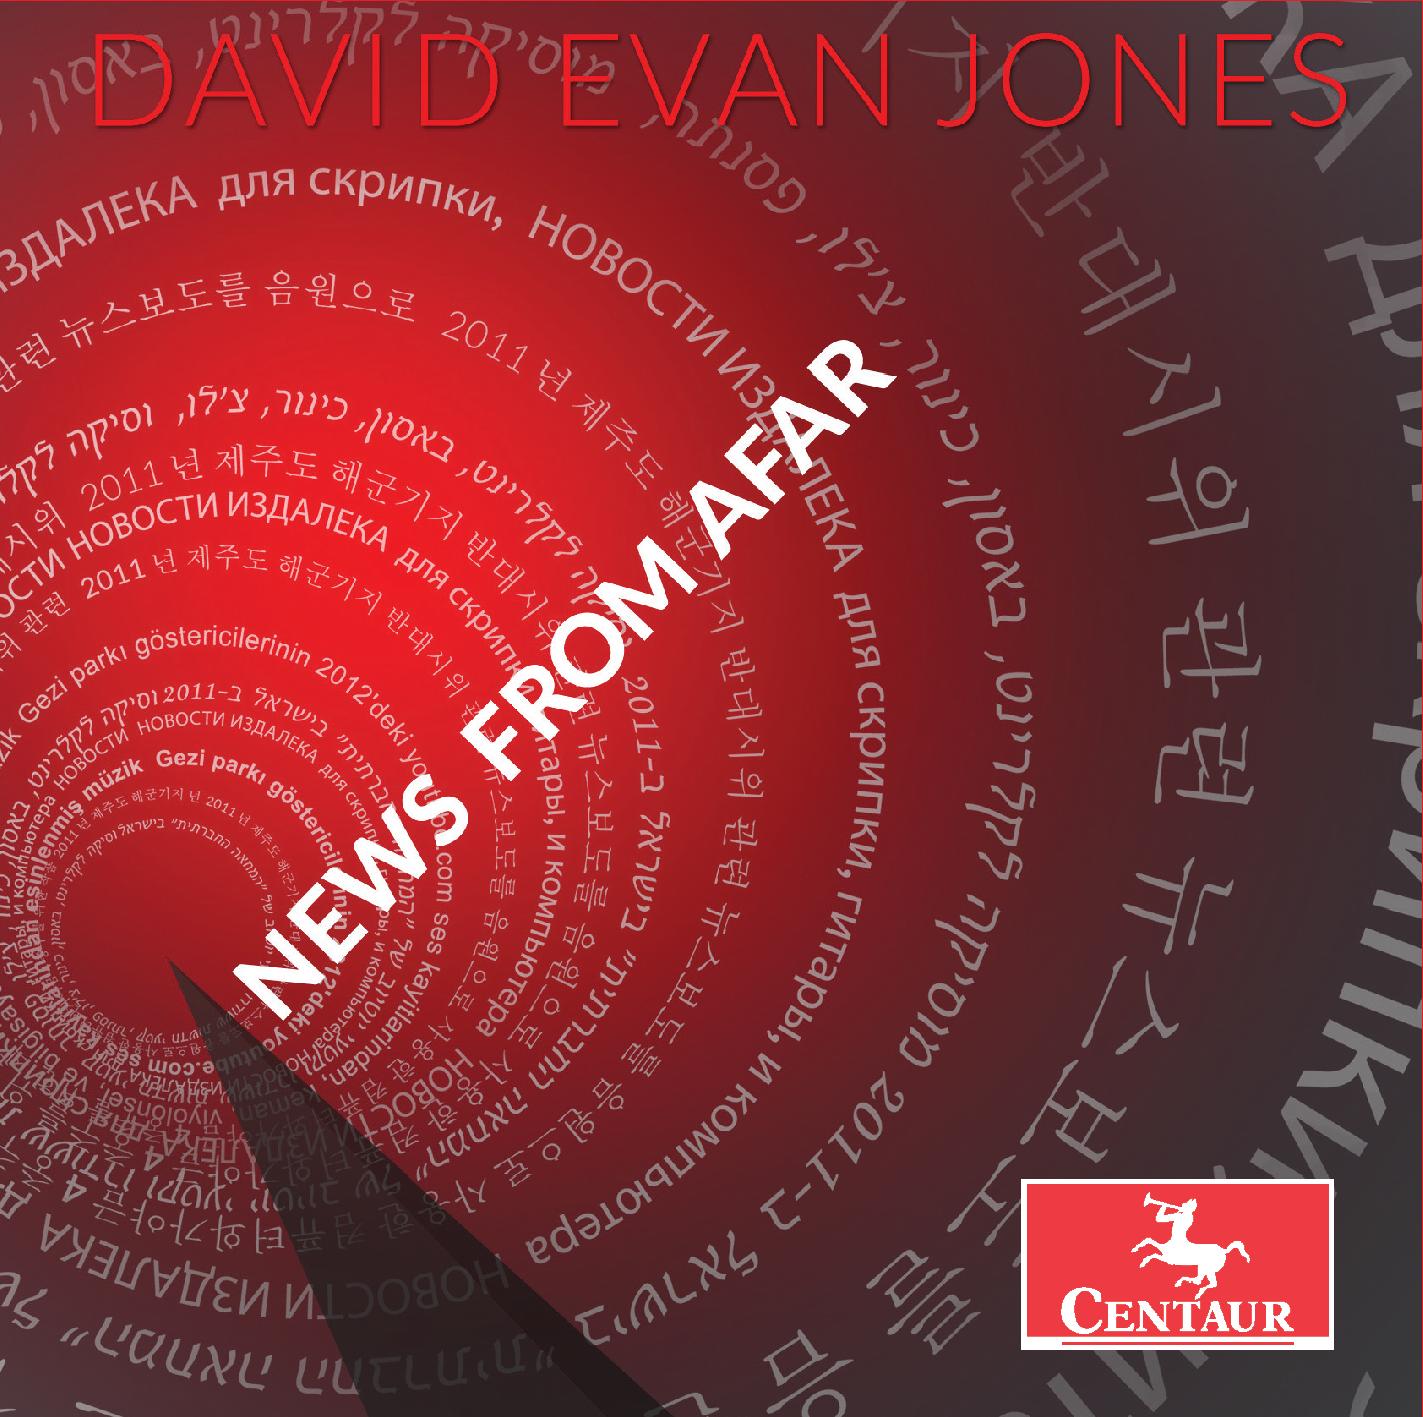 News From Afar - CD Cover | Music Department | UC Santa Cruz